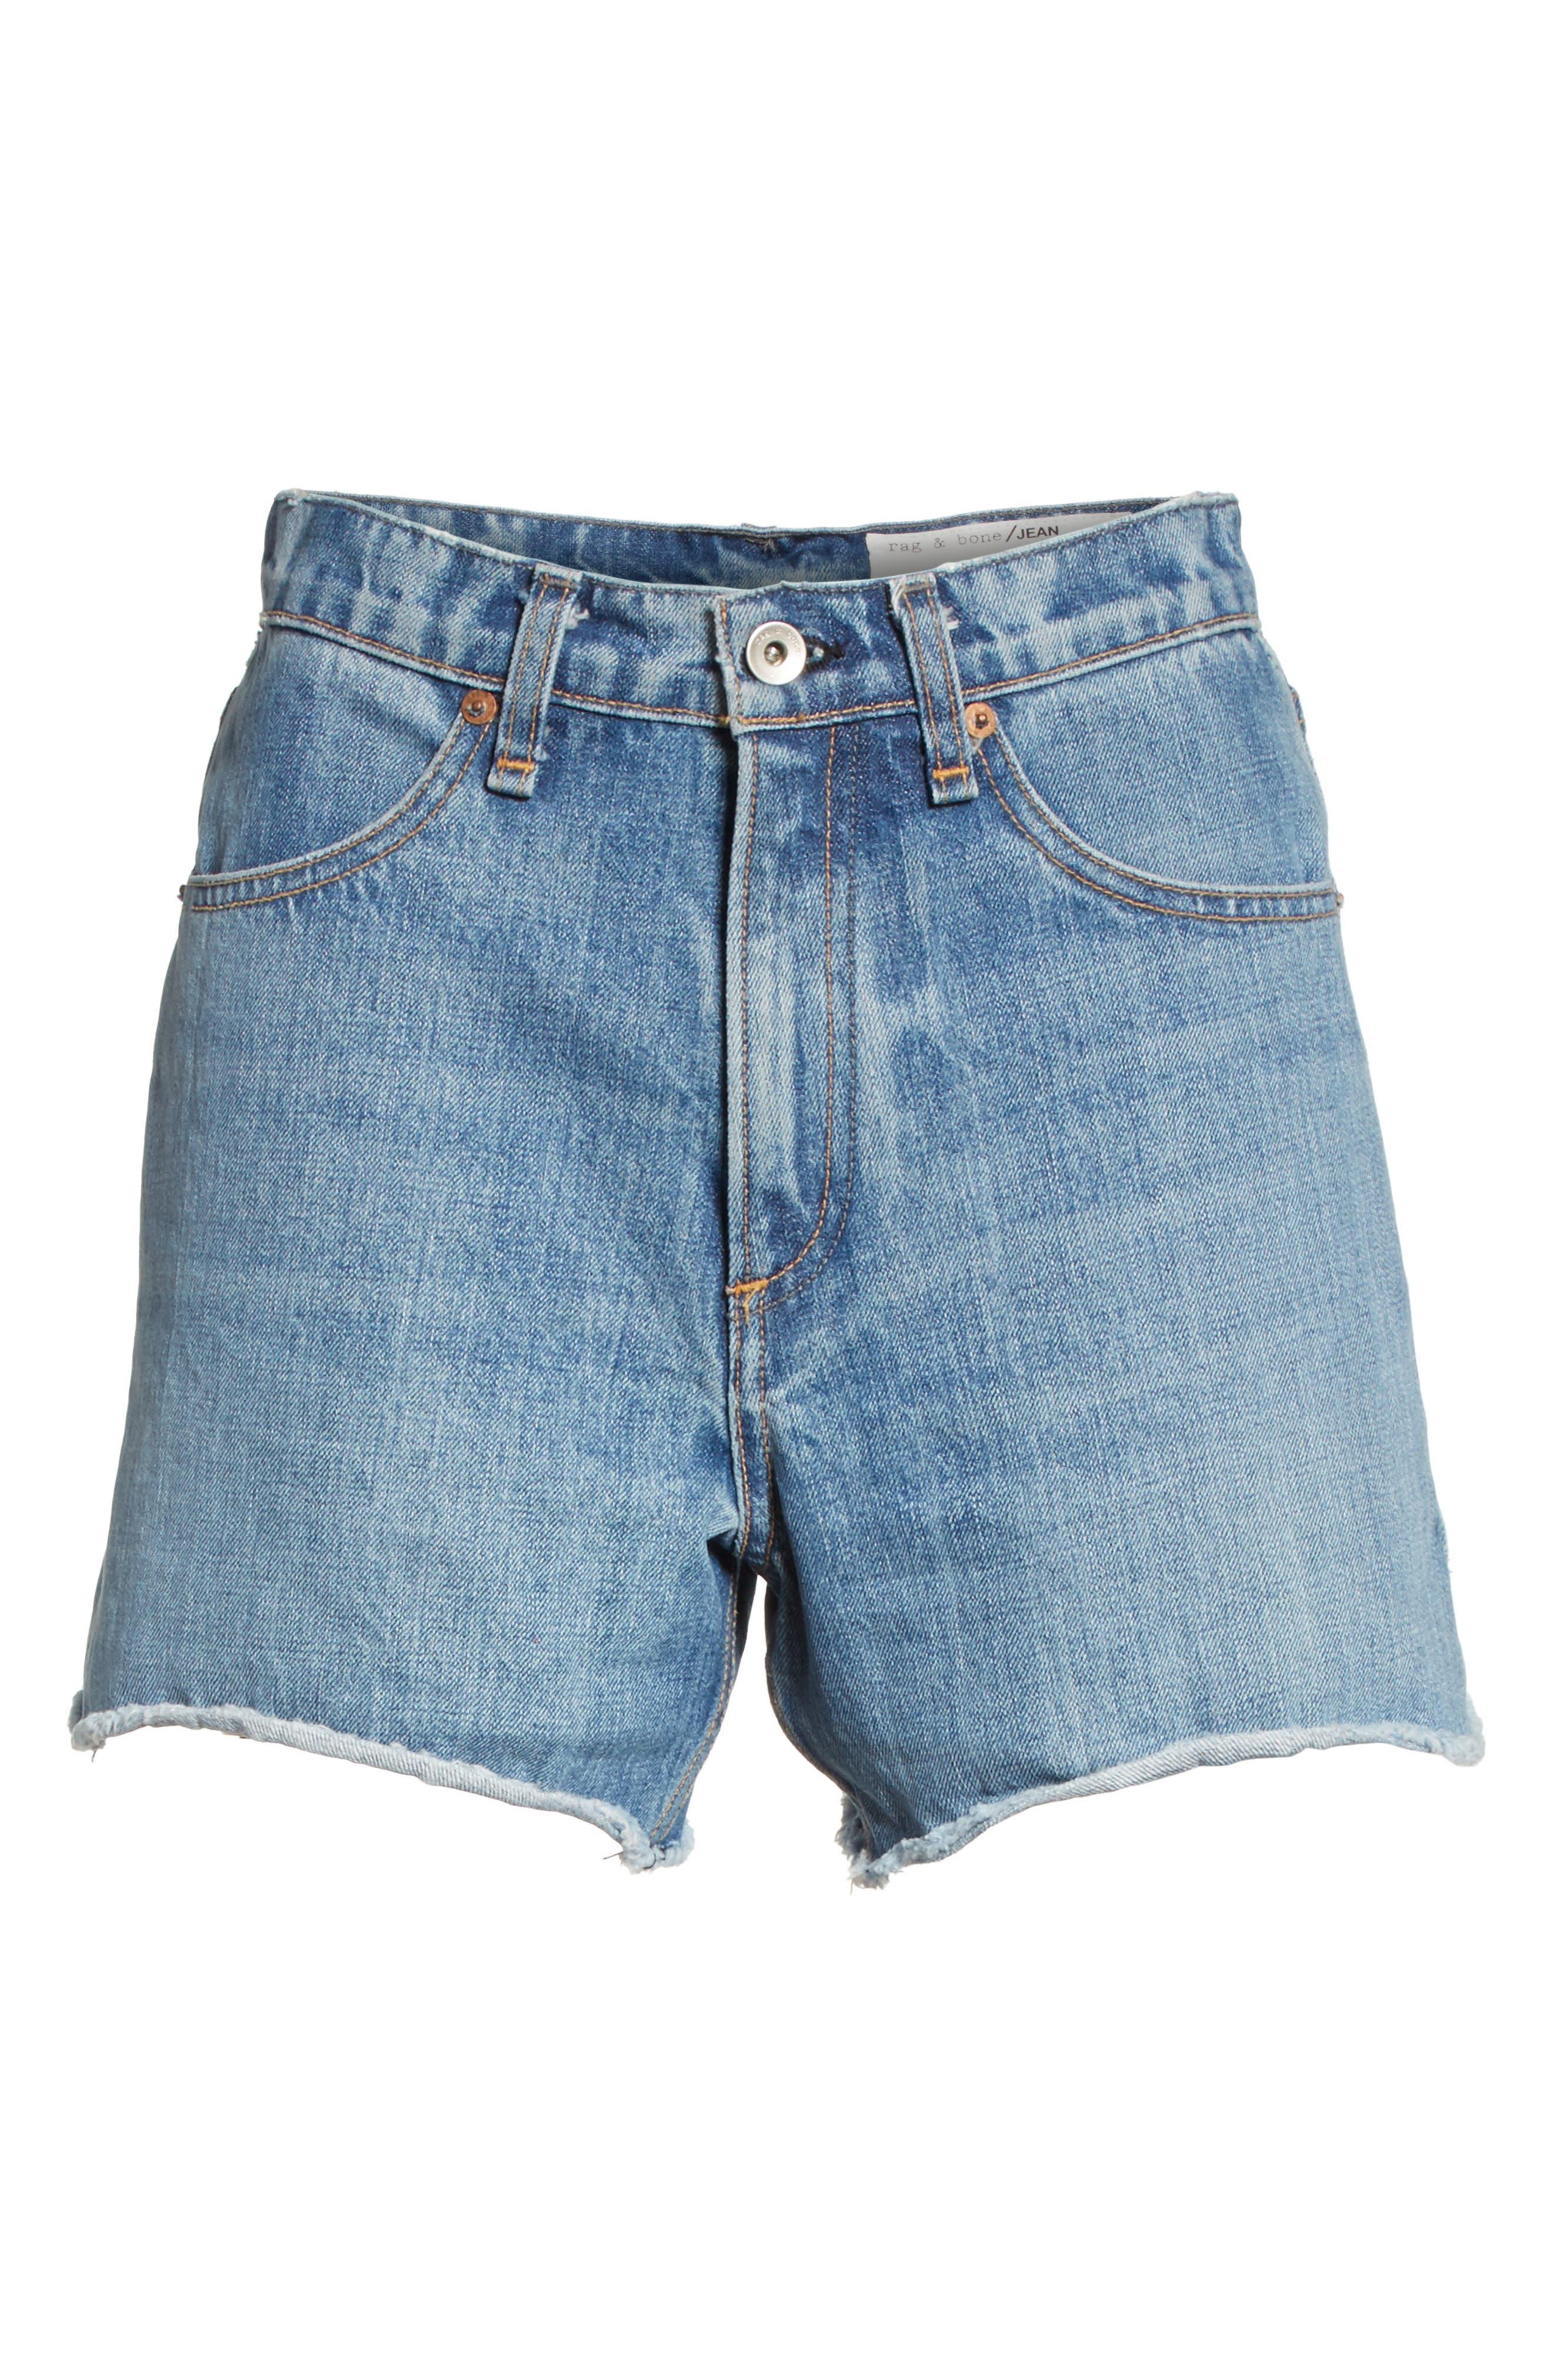 Torti High Waist Denim Shorts,                             Alternate thumbnail 6, color,                             400